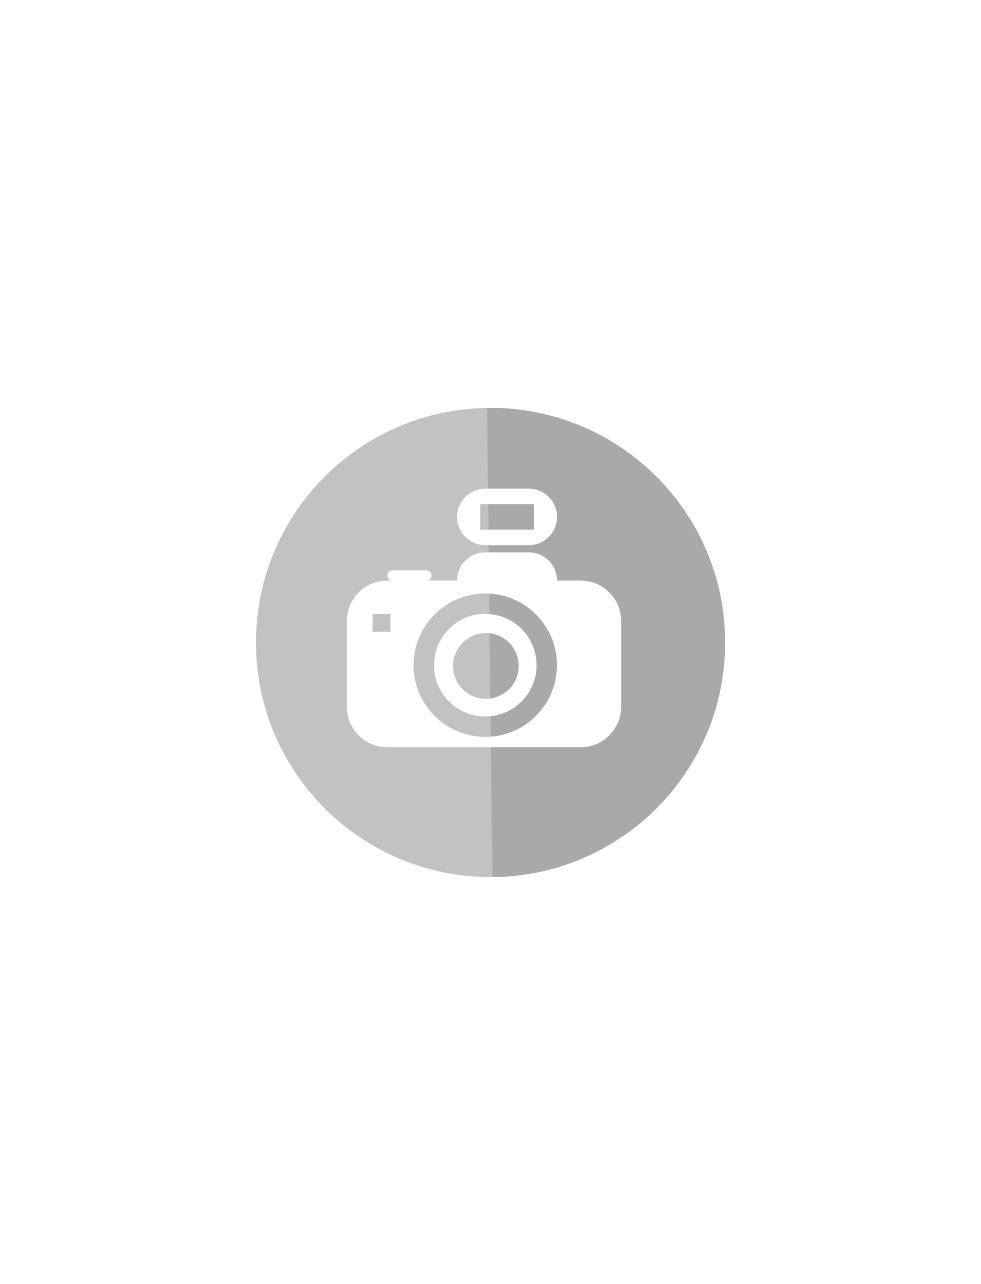 30084722_sparepart/BS-Wand-Regal 90-FWZ